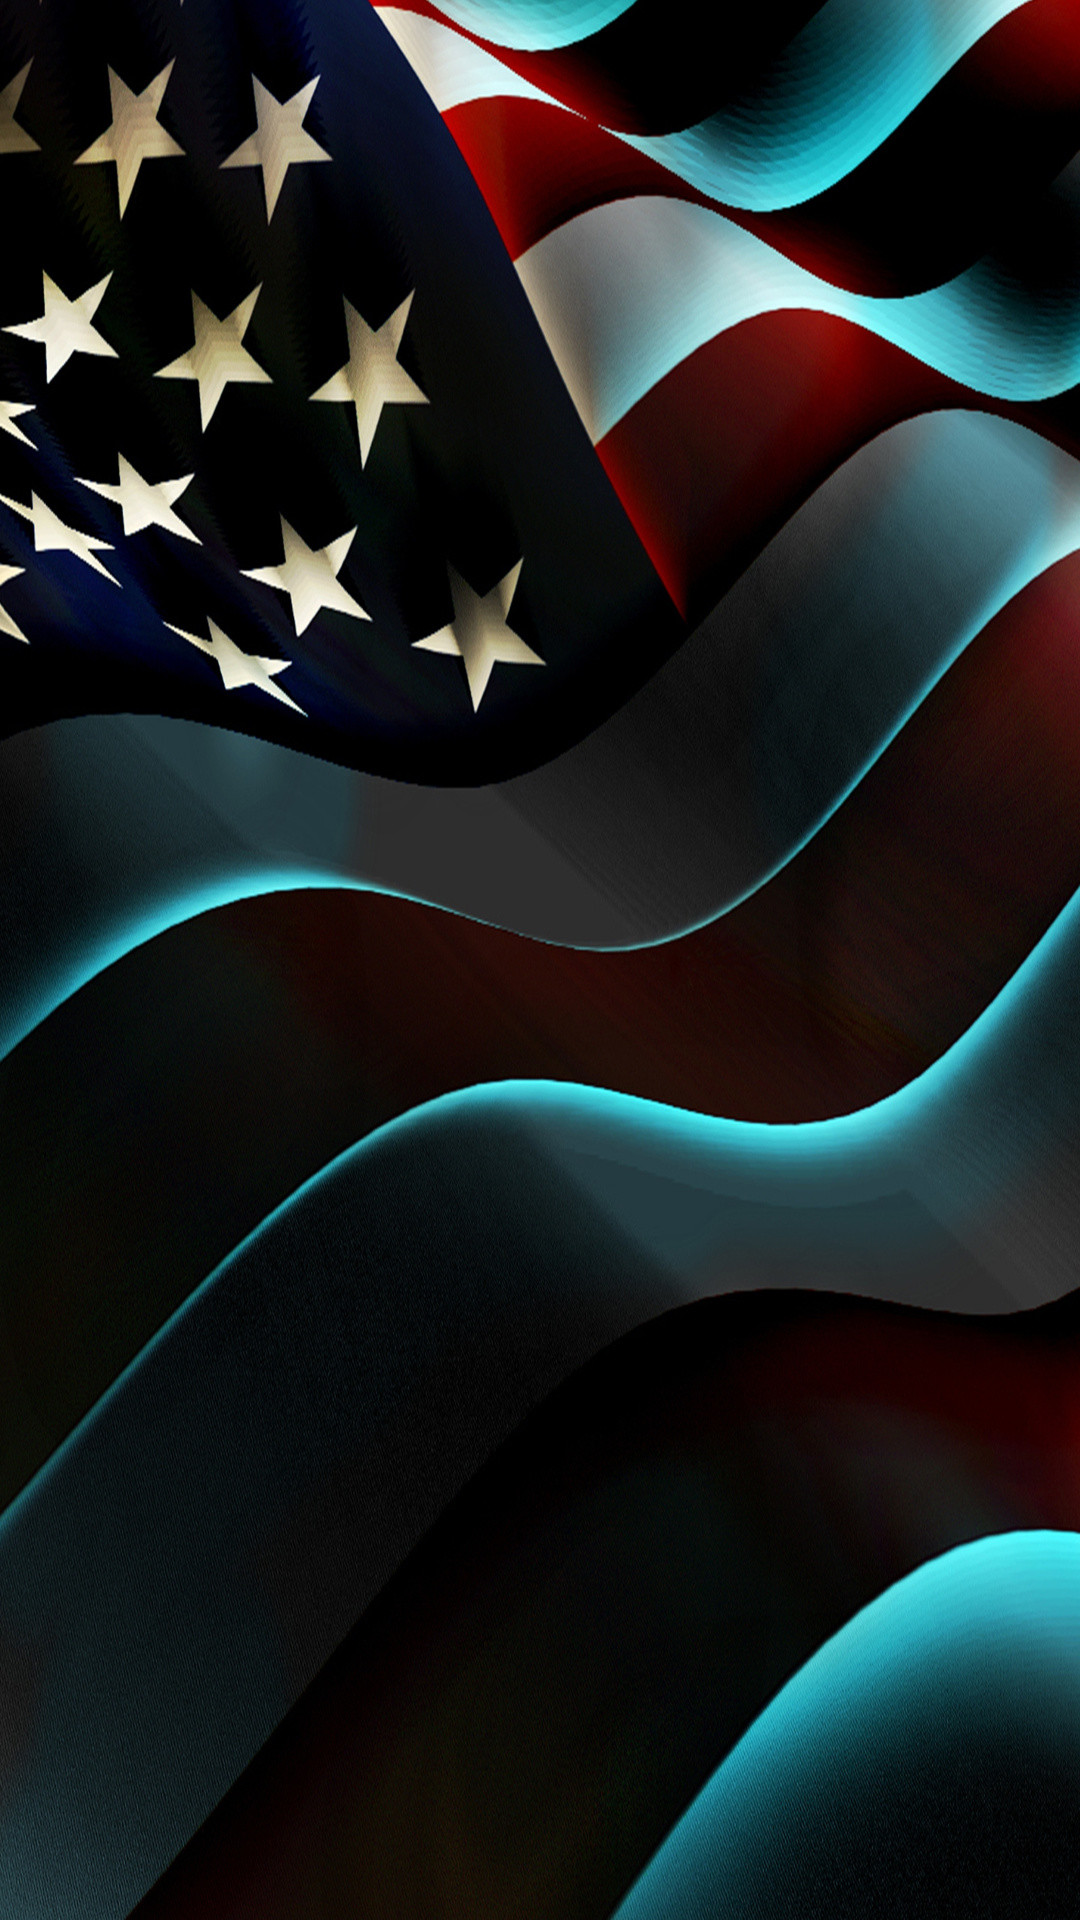 1920x1080 Best Ideas About American Flag Wallpaper On Pinterest